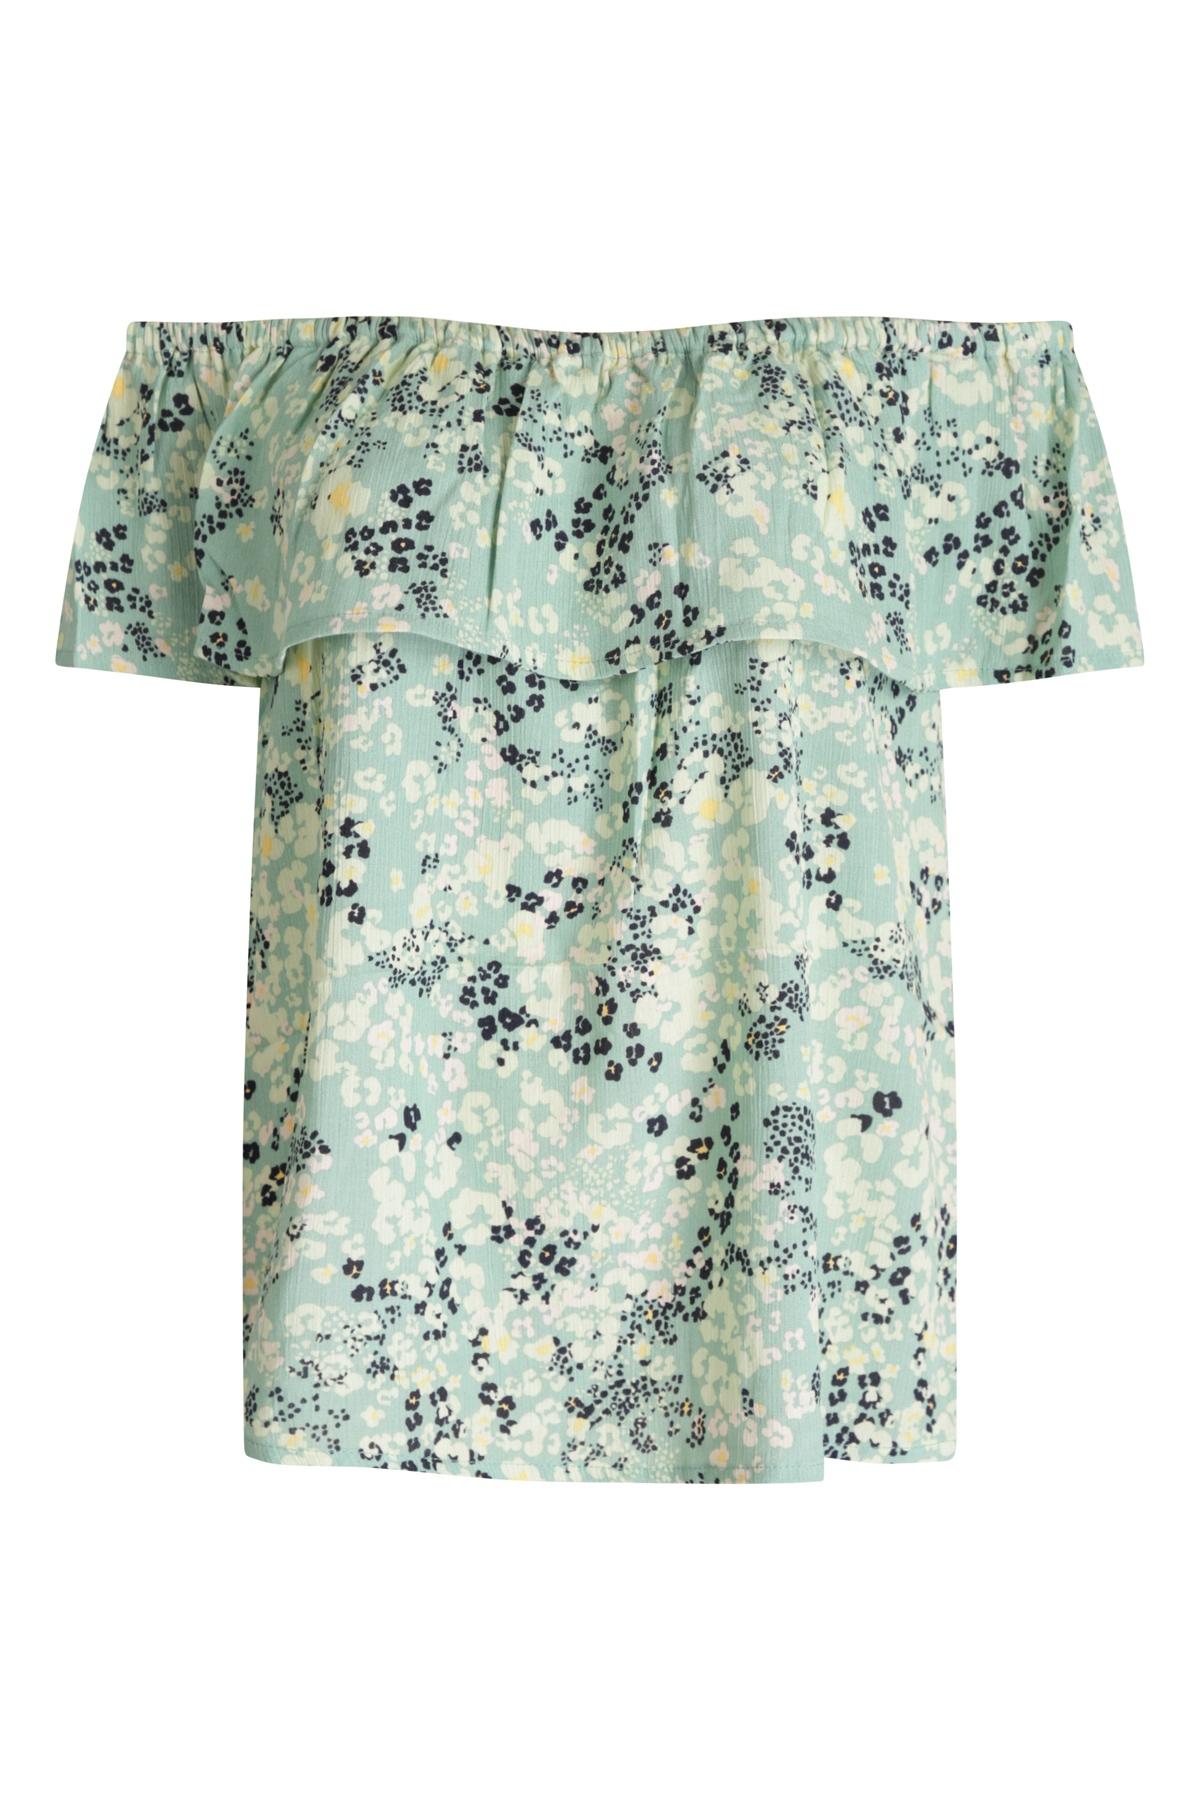 ICHI Shirt - Top Multicolor Ihmarrakech AOP SS4